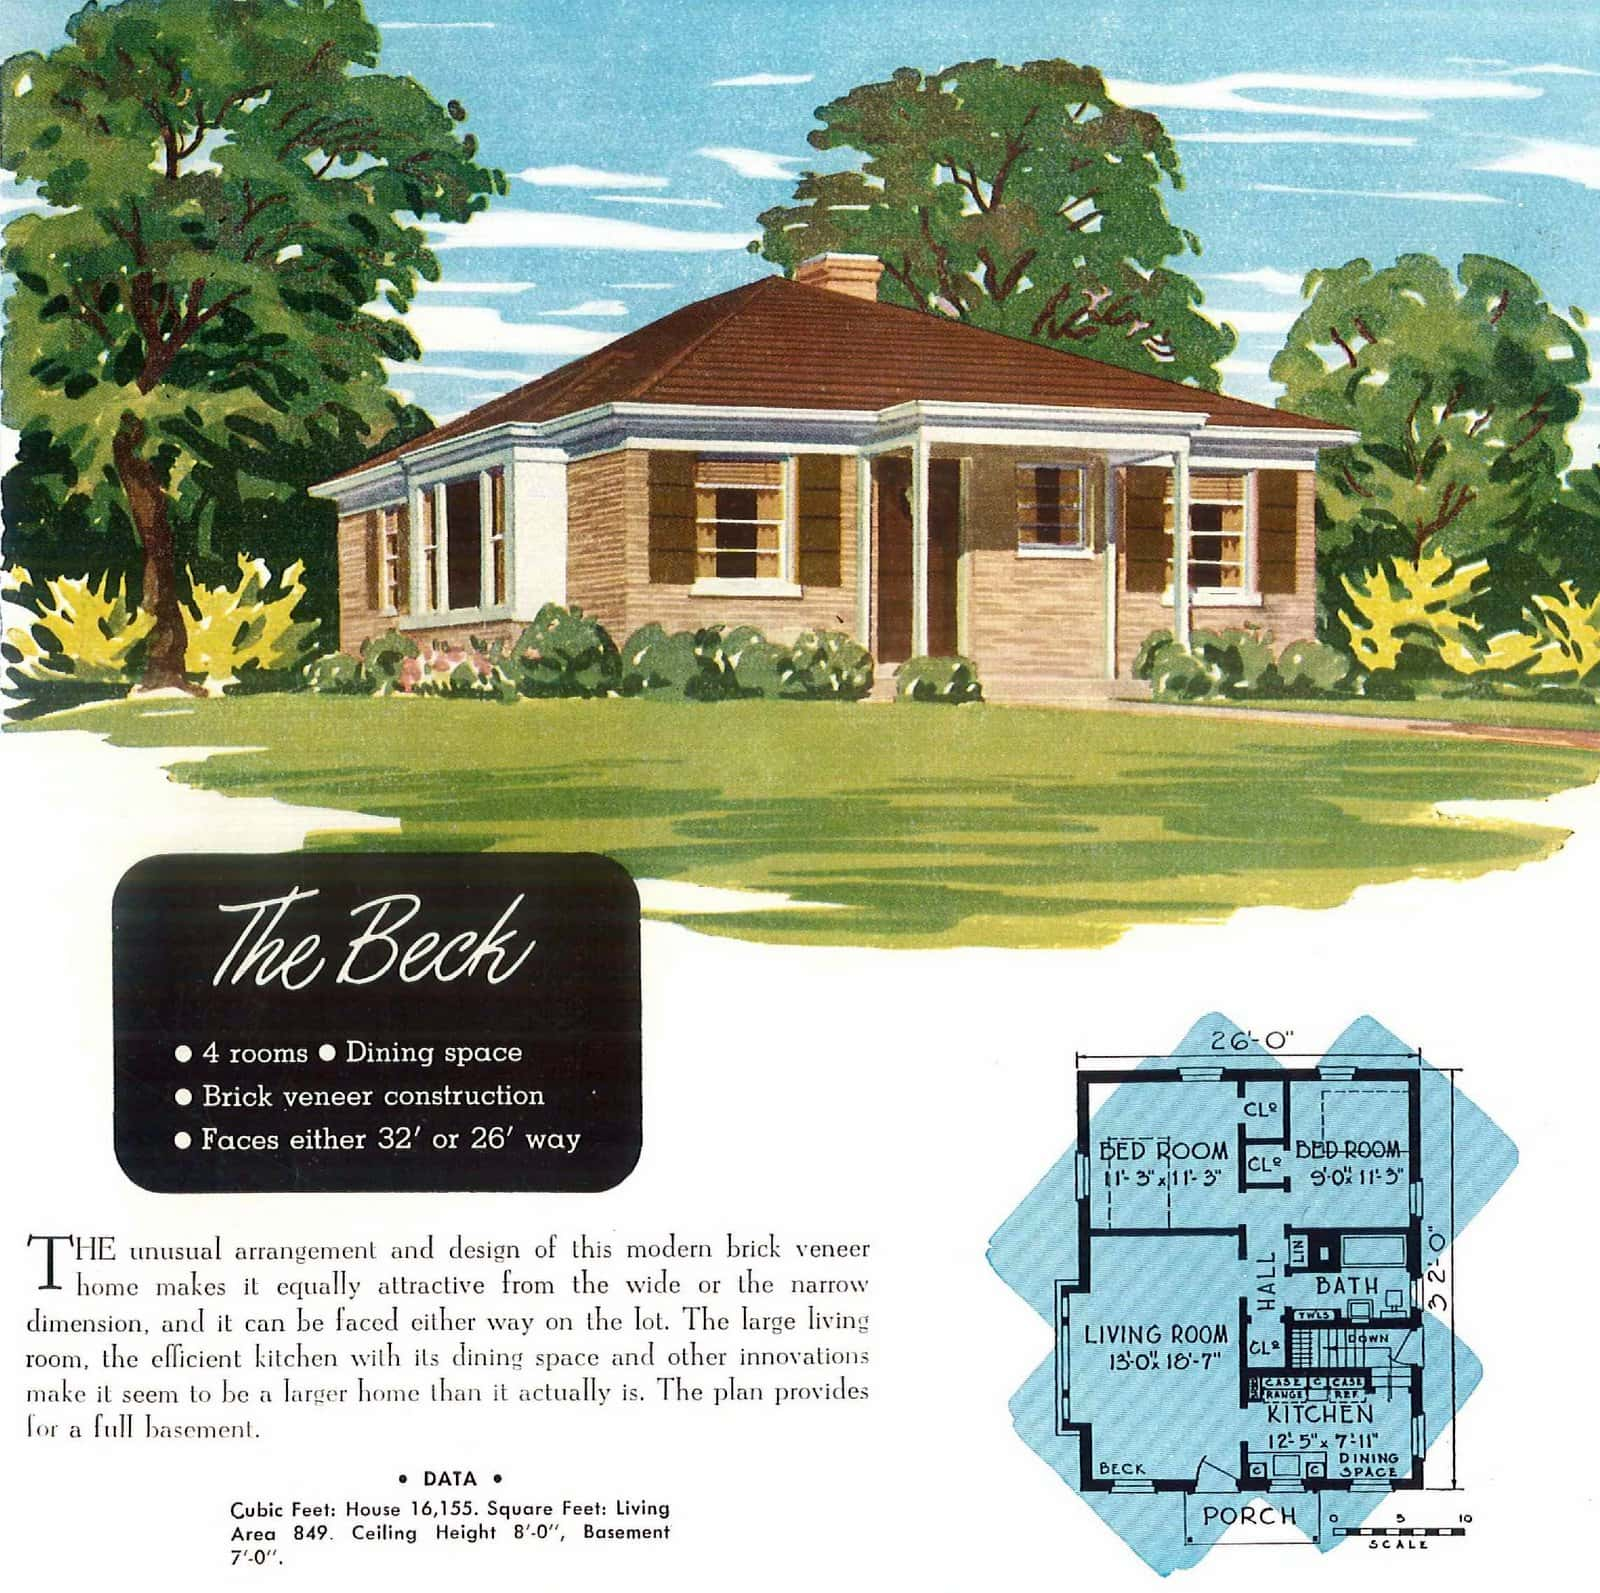 Vintage 40s post-war starter home designs from 1949 (2)